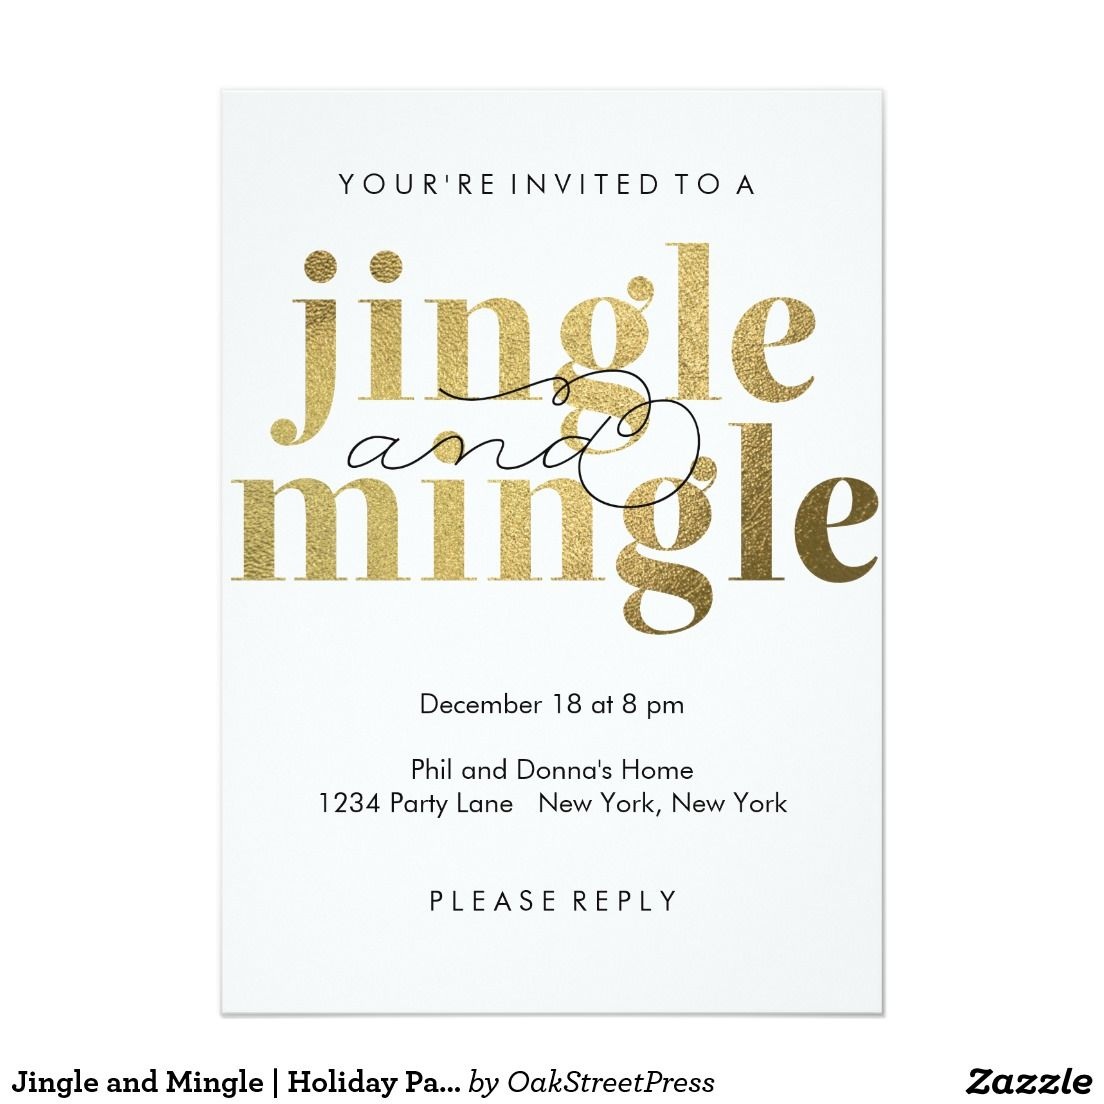 Jingle and Mingle | Holiday Party Invitations | Holiday party ...